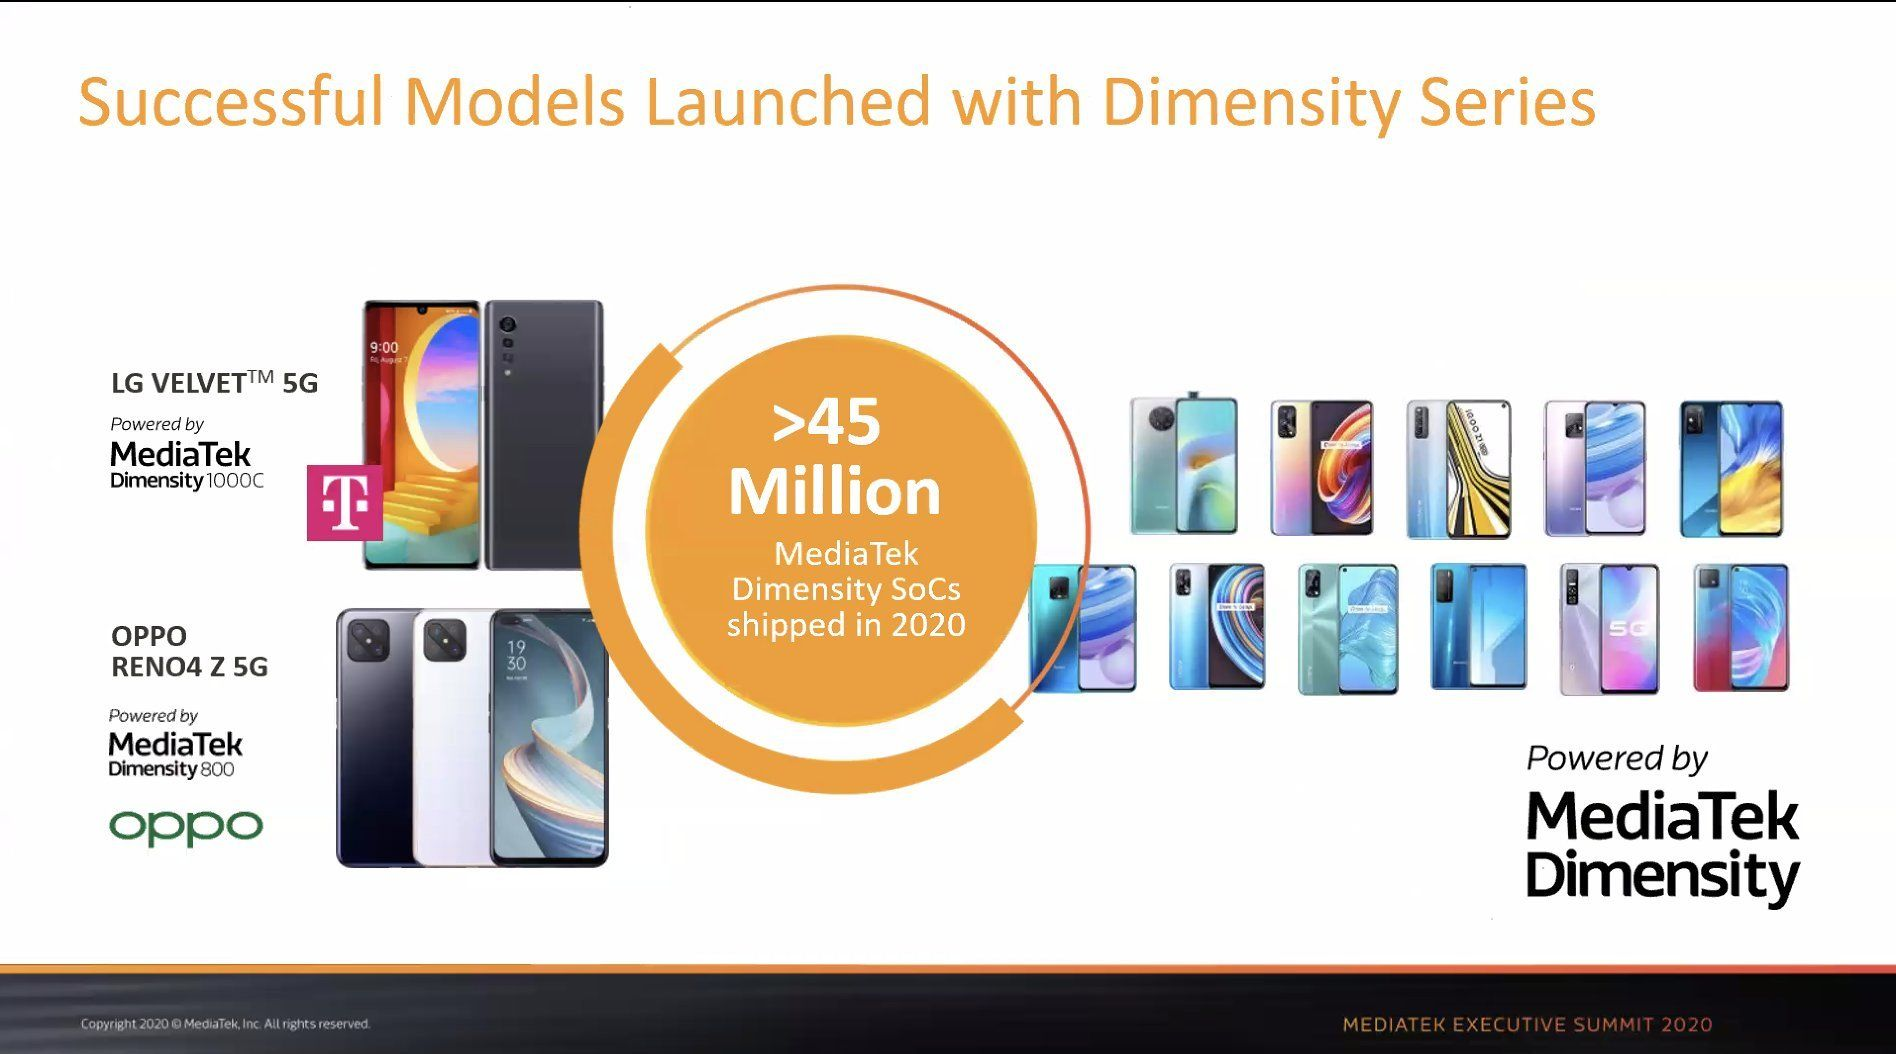 MediaTekは2020年にDimensity 5G搭載製品が4500万台出荷したことを発表